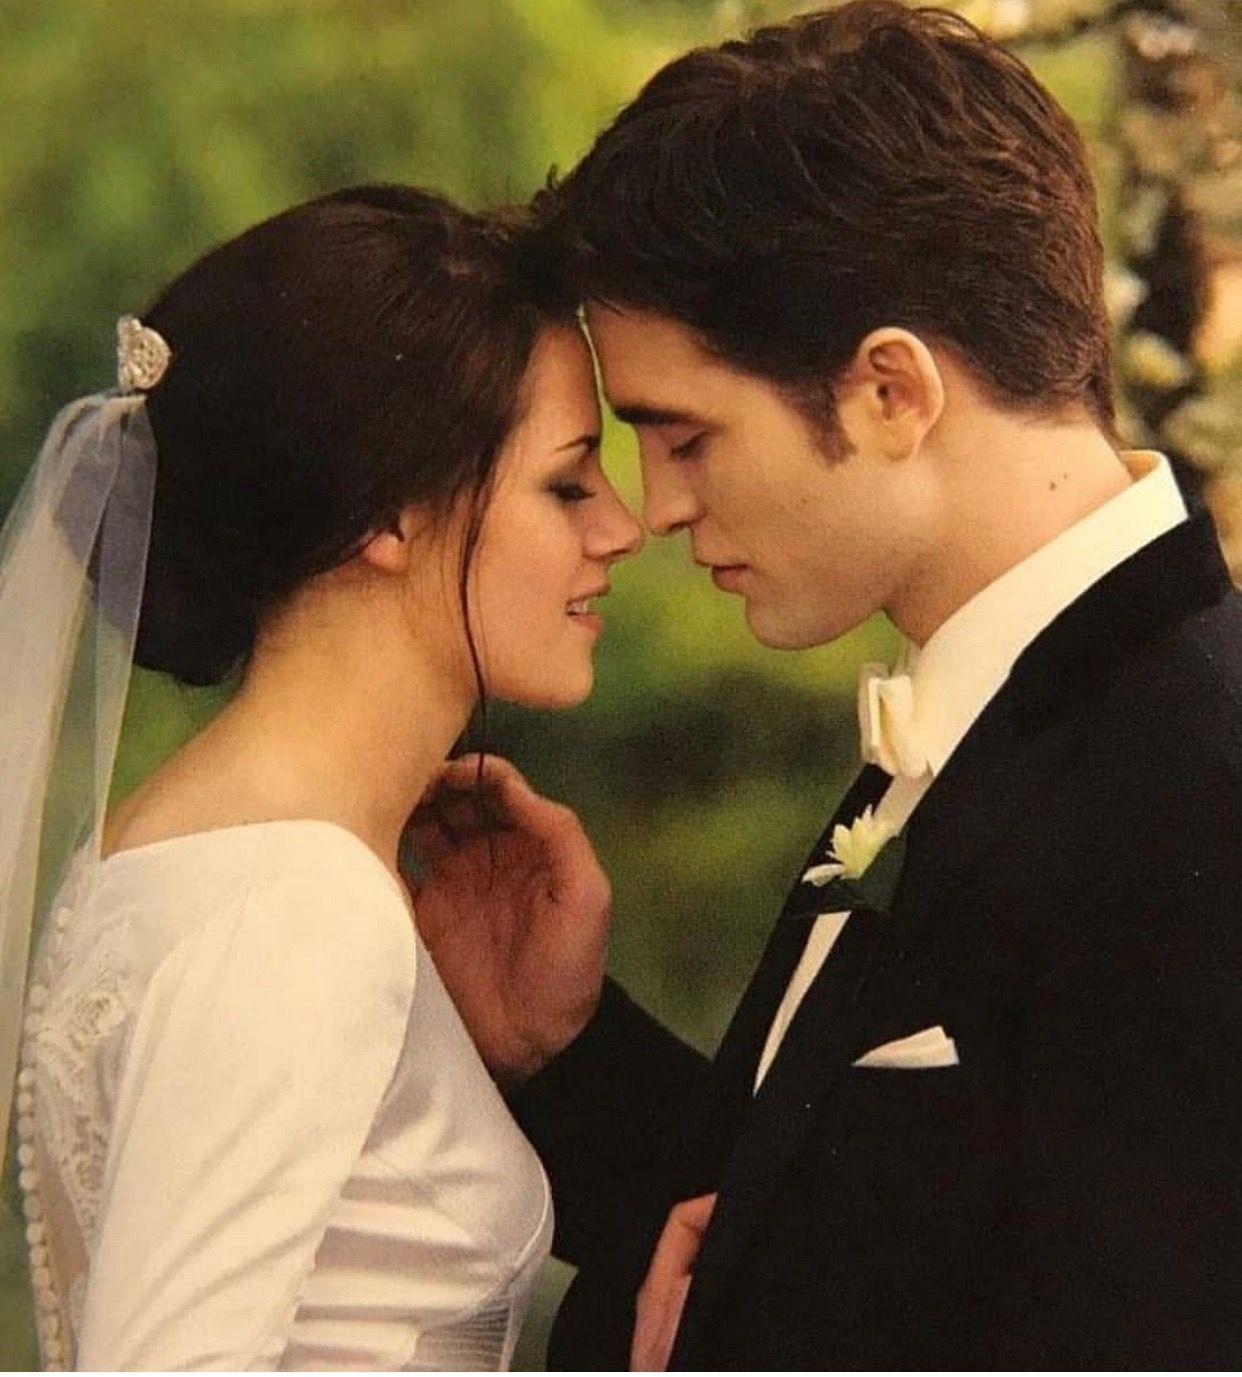 Pin By Pamela Conaty On Breaking Dawn Parte 1 Twilight Saga Twilight Film Twilight Movie [ 1377 x 1242 Pixel ]